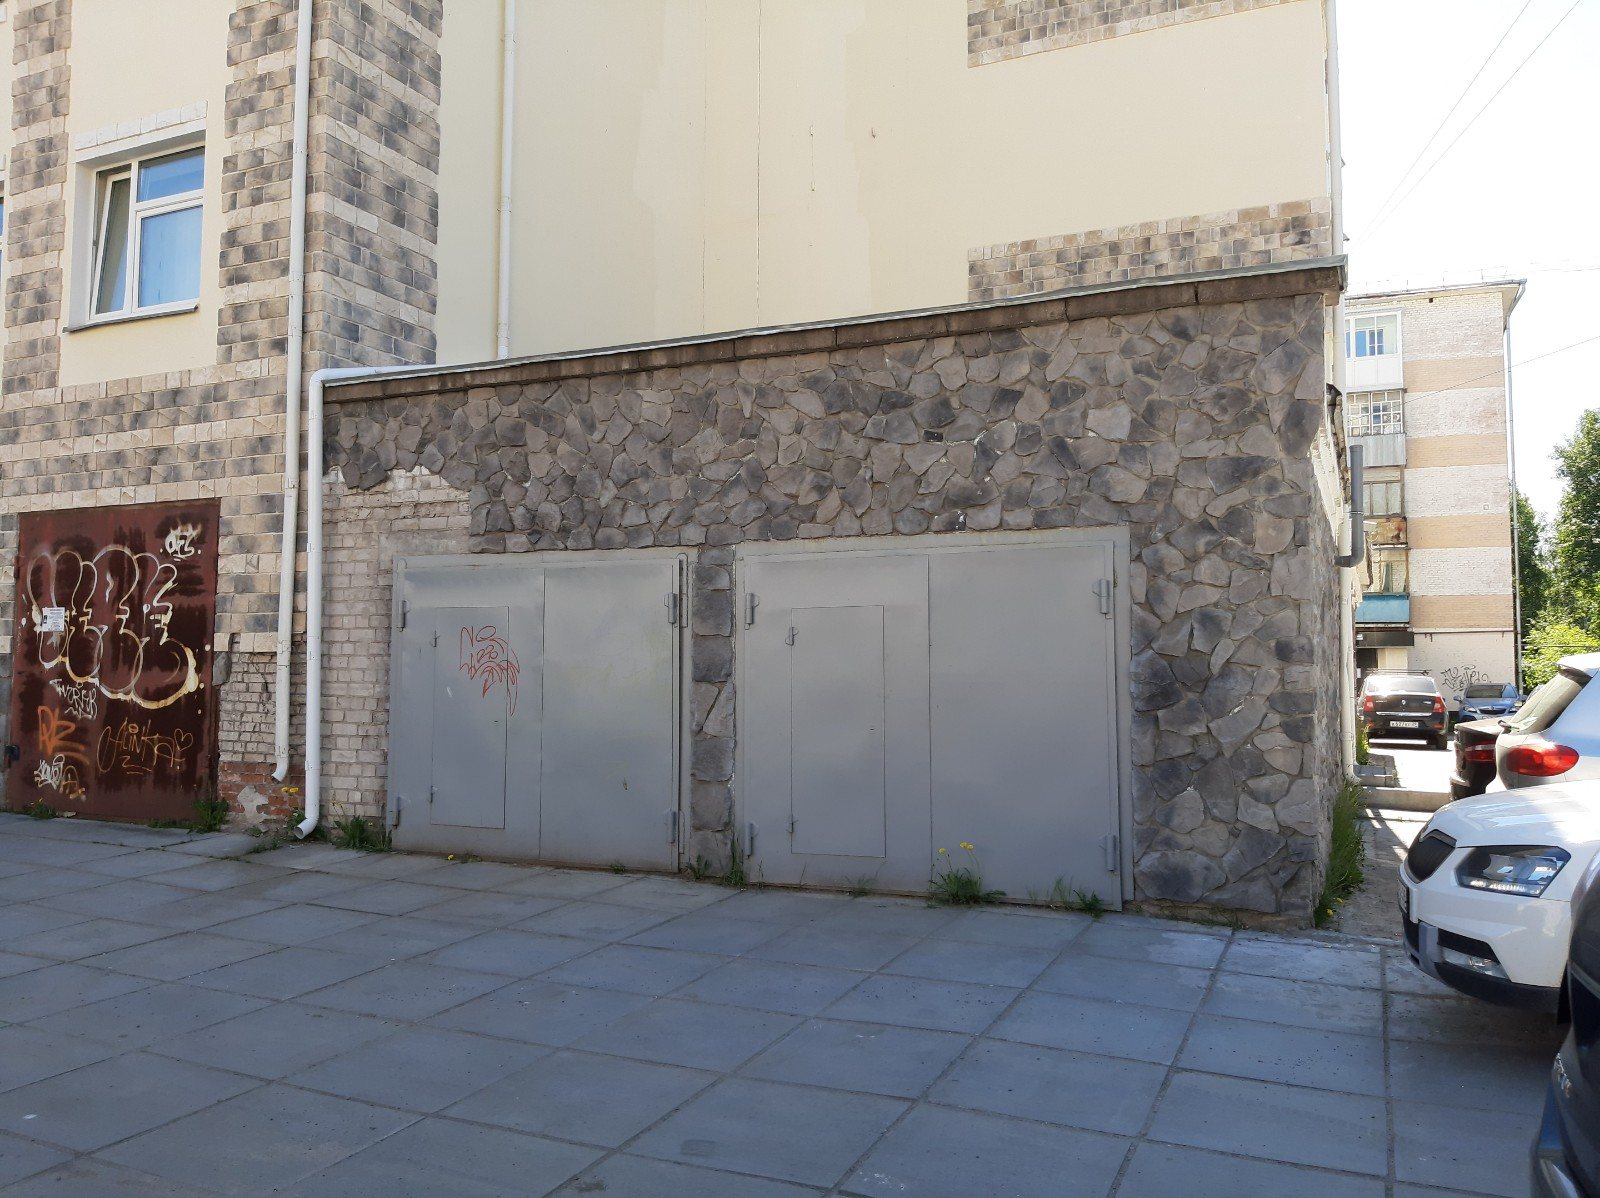 Аренда гаража в г. Архангельске